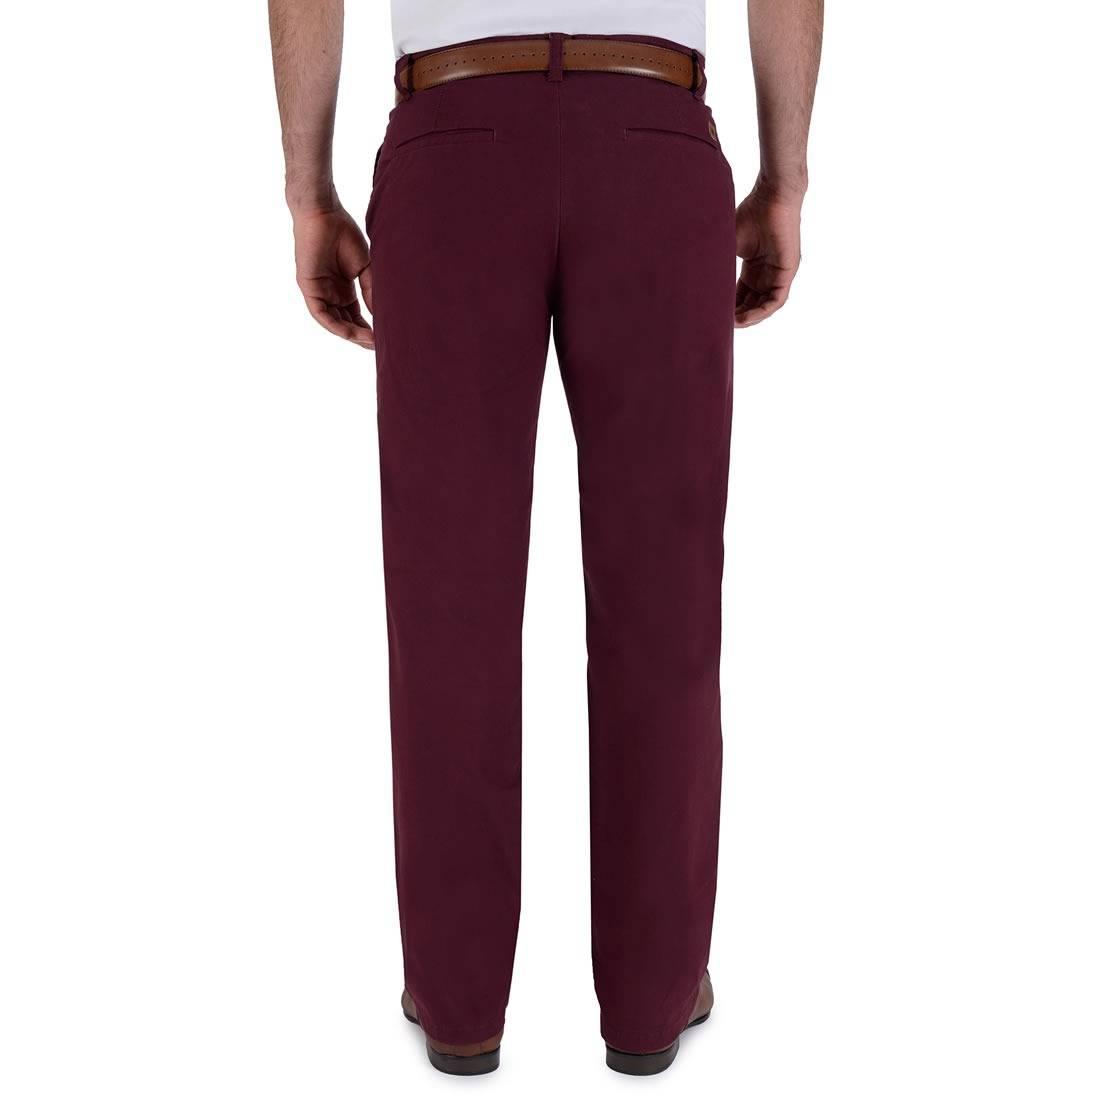 010811077434-02-Pantalon-Casual-Sin-Pinzas-Classic-Fit-Con-Elastano-Vino-yale